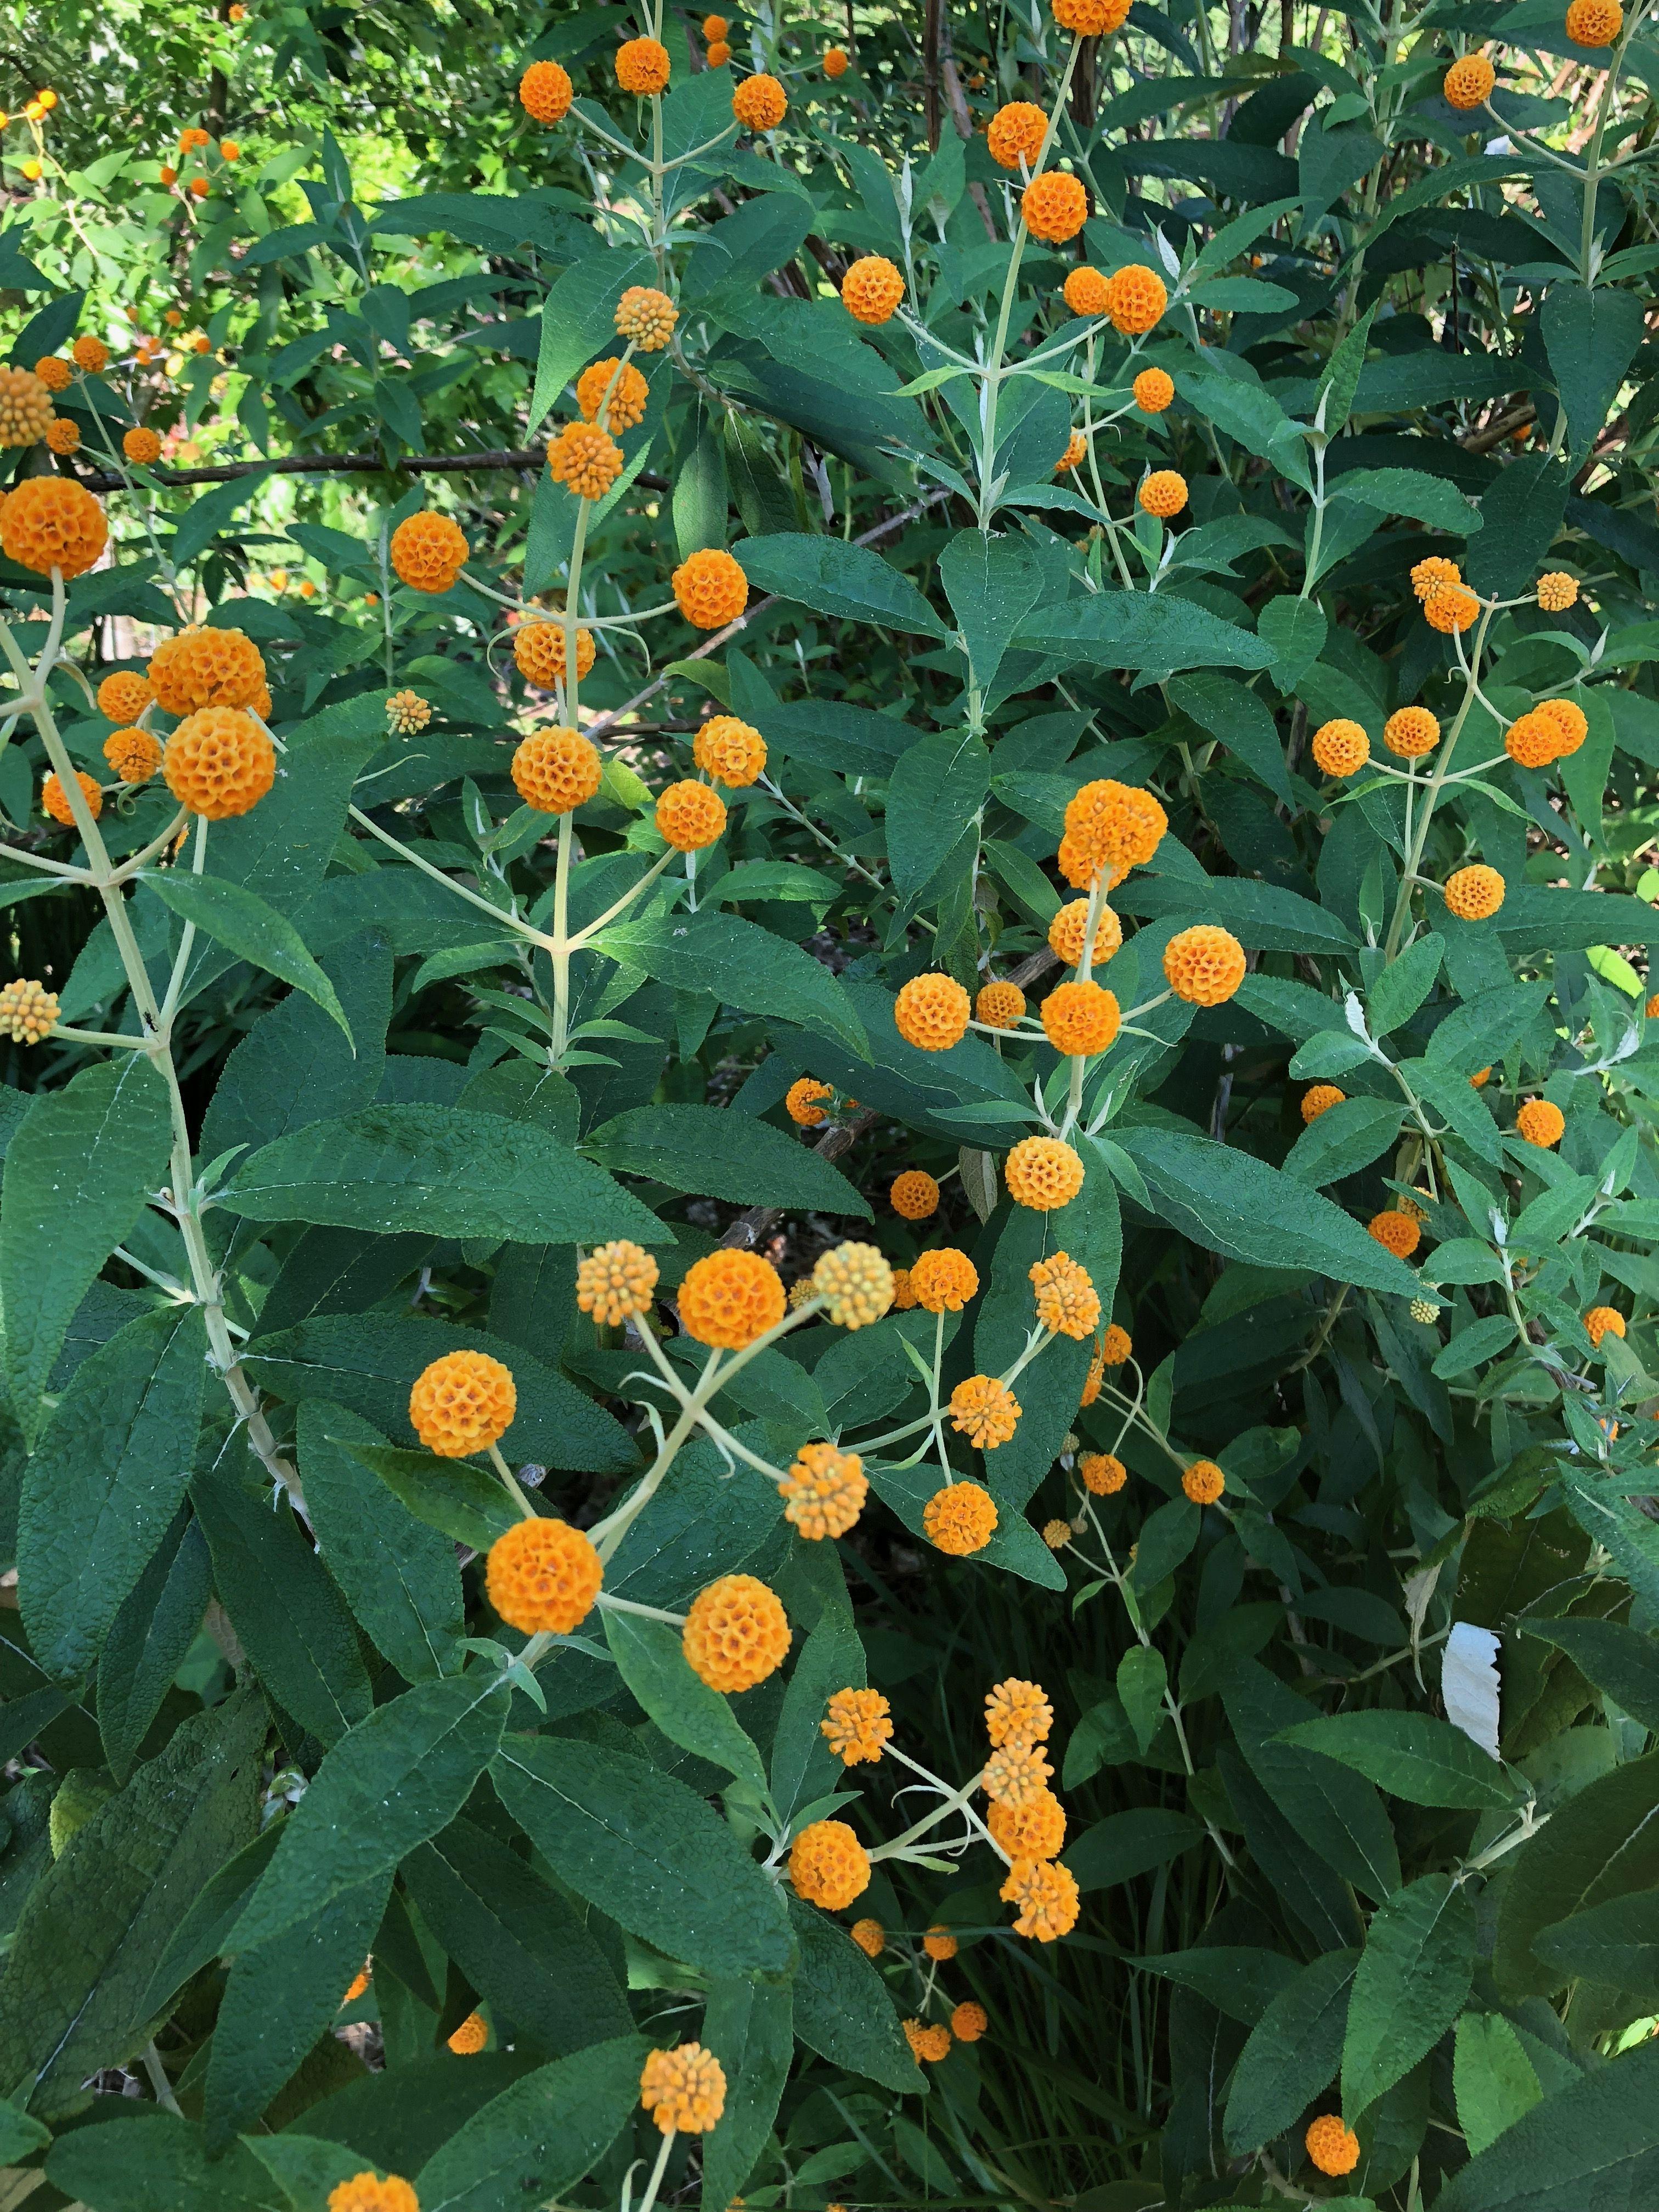 Buddleia Globosa Flowering Shrubs Shrubs Herbaceous Border